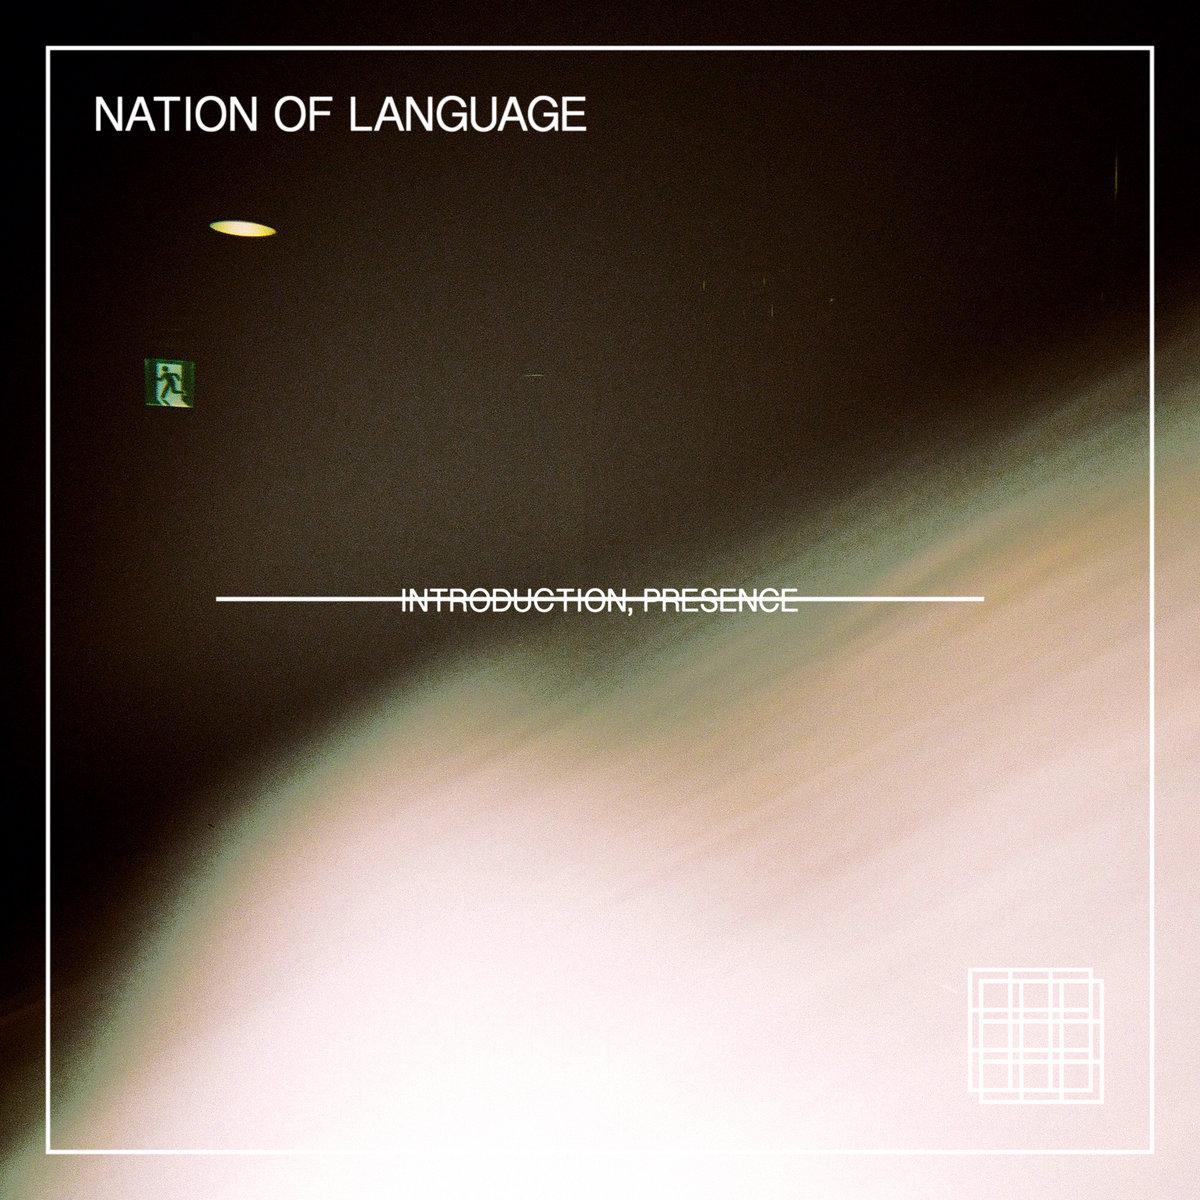 Introduction, Presence | Nation of Language